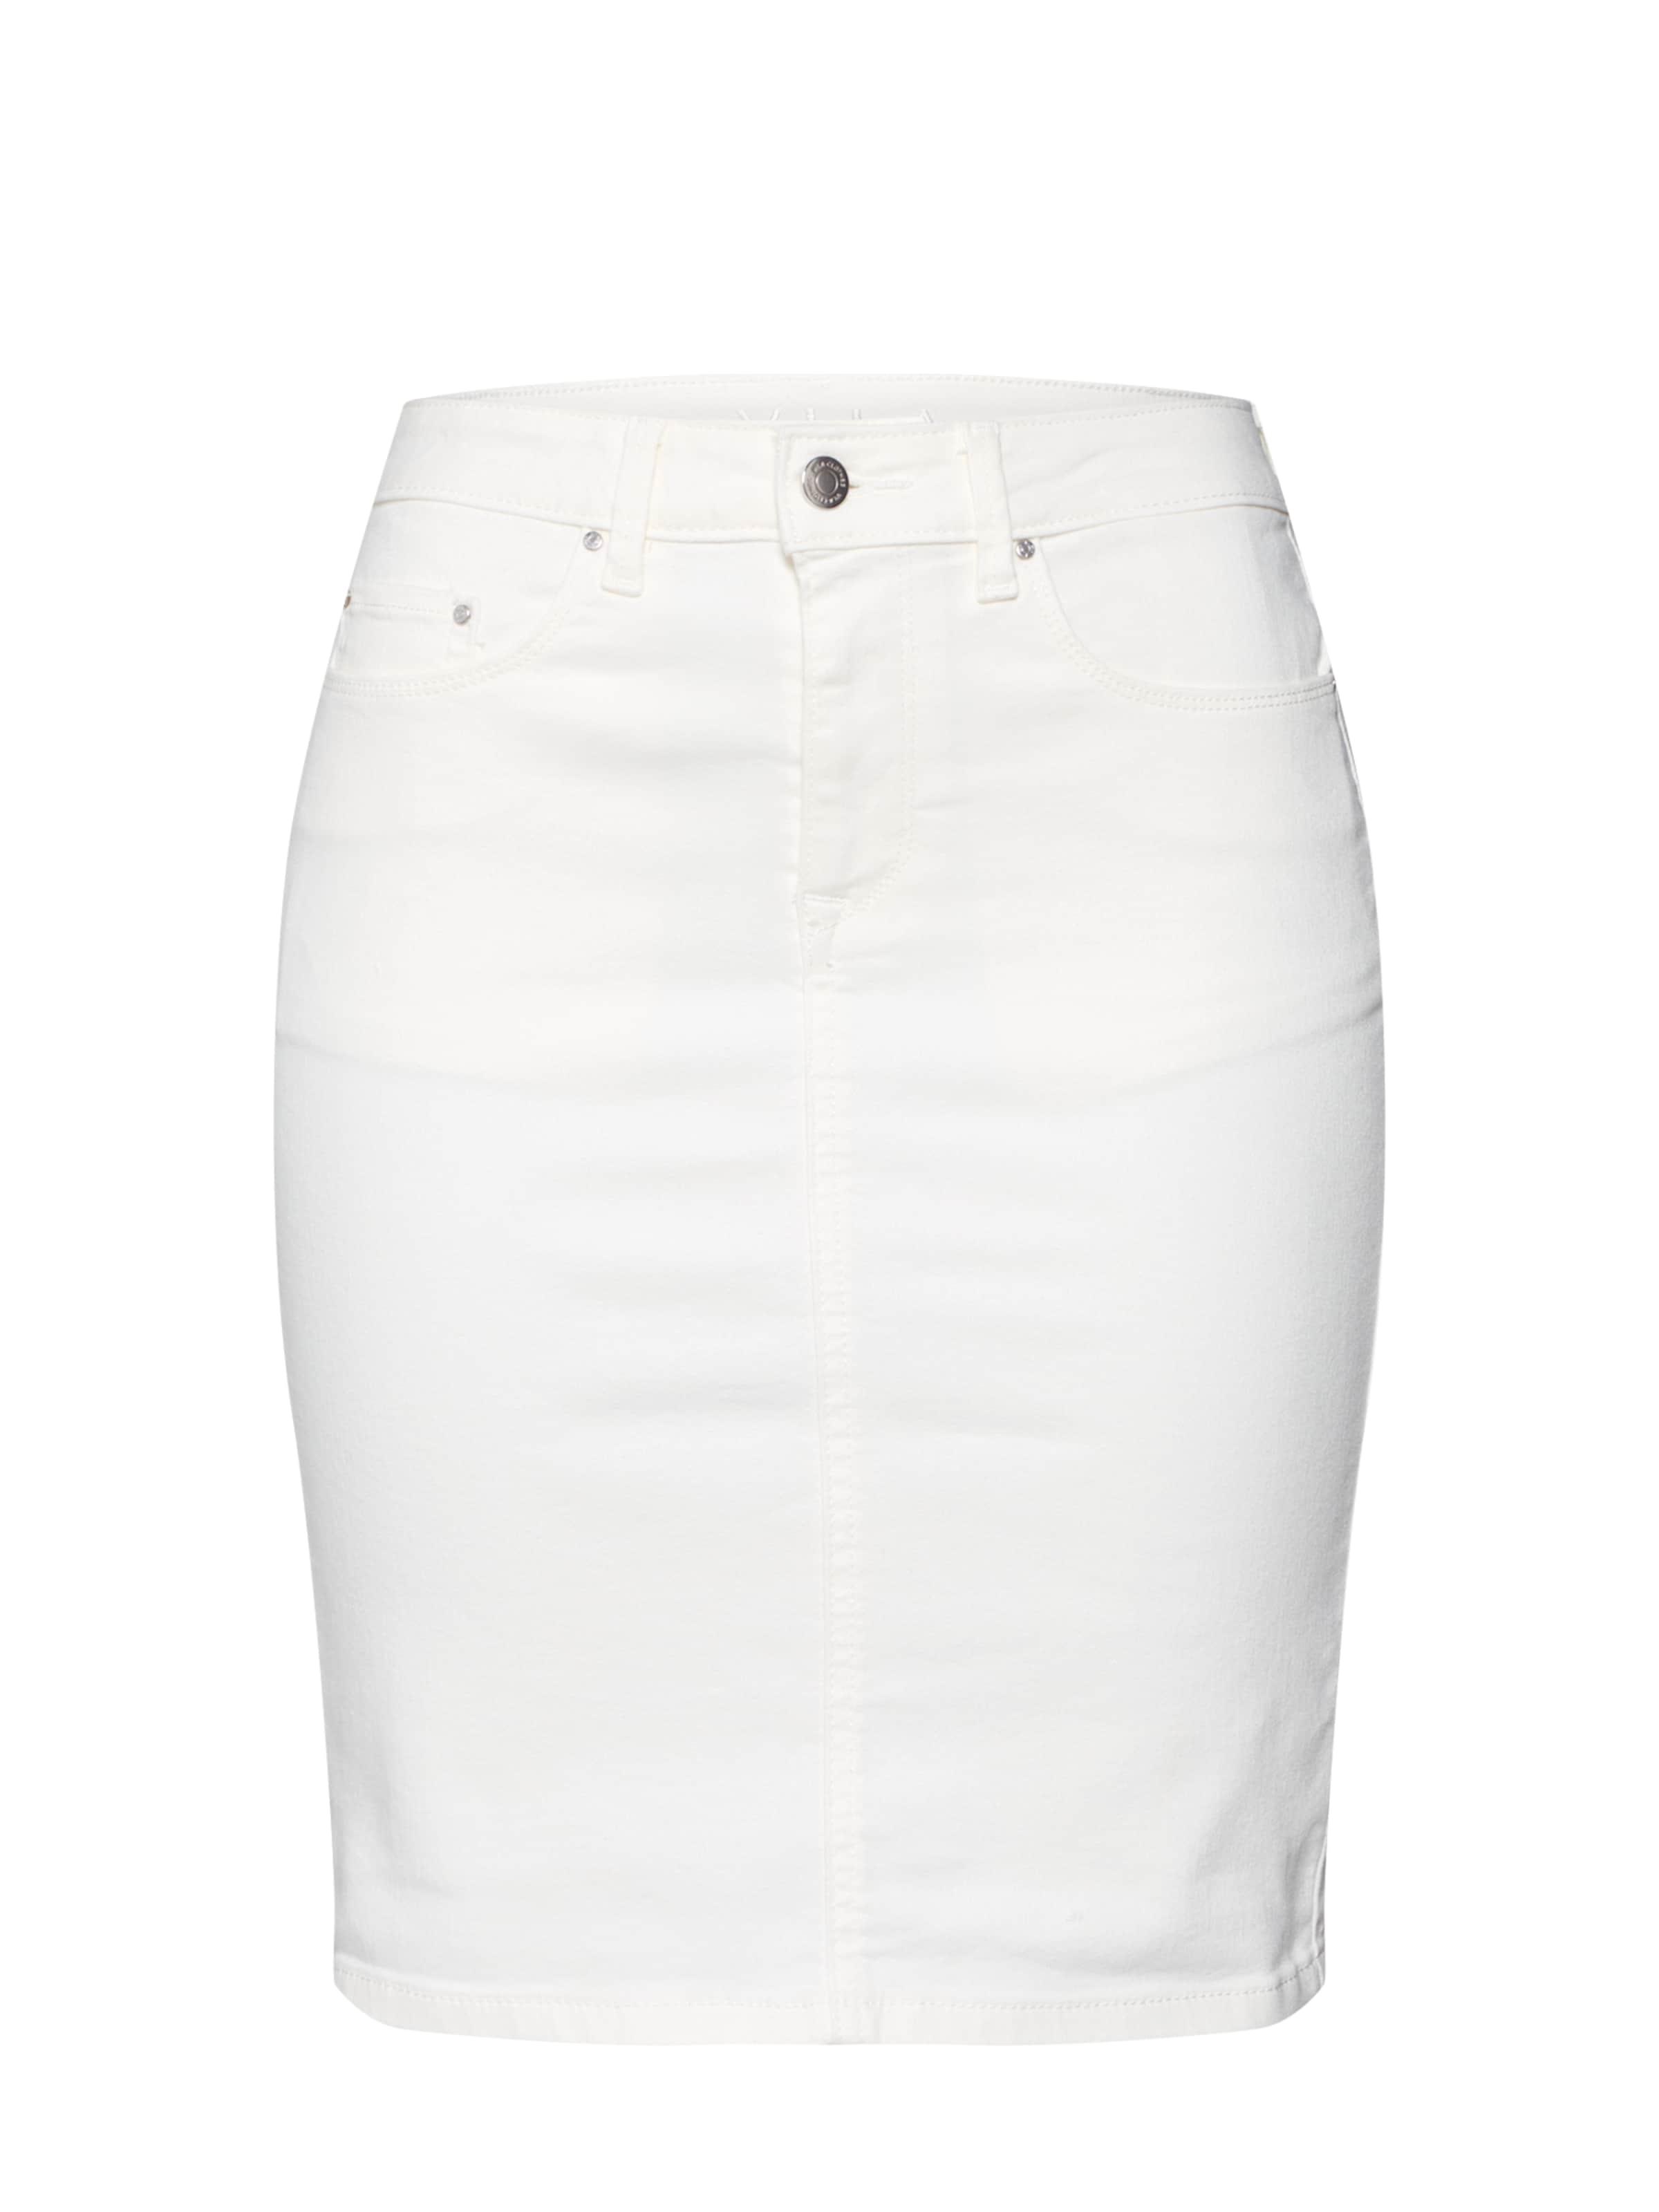 'vicommit Felicia Vila Bleu En Short Denim Jupe Skirt' R5jL4A